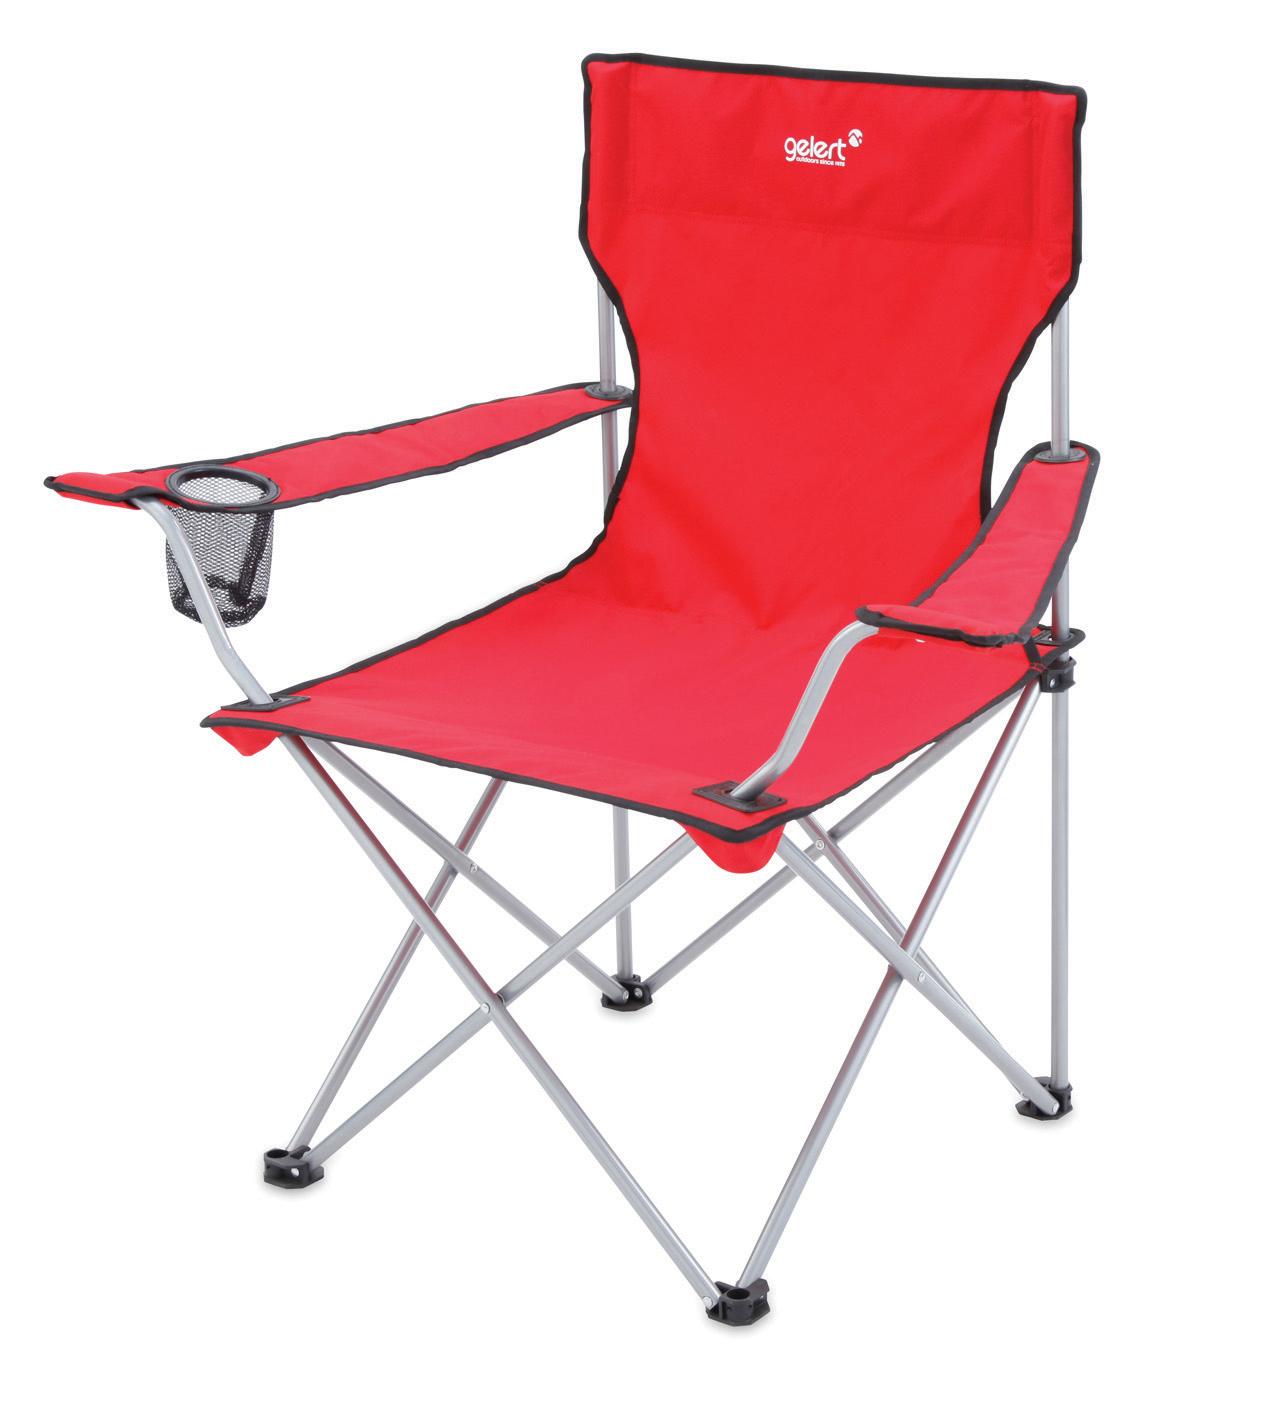 Gelert Tourer Fold Up Camping Executive Directors Chair & Drinks Holder